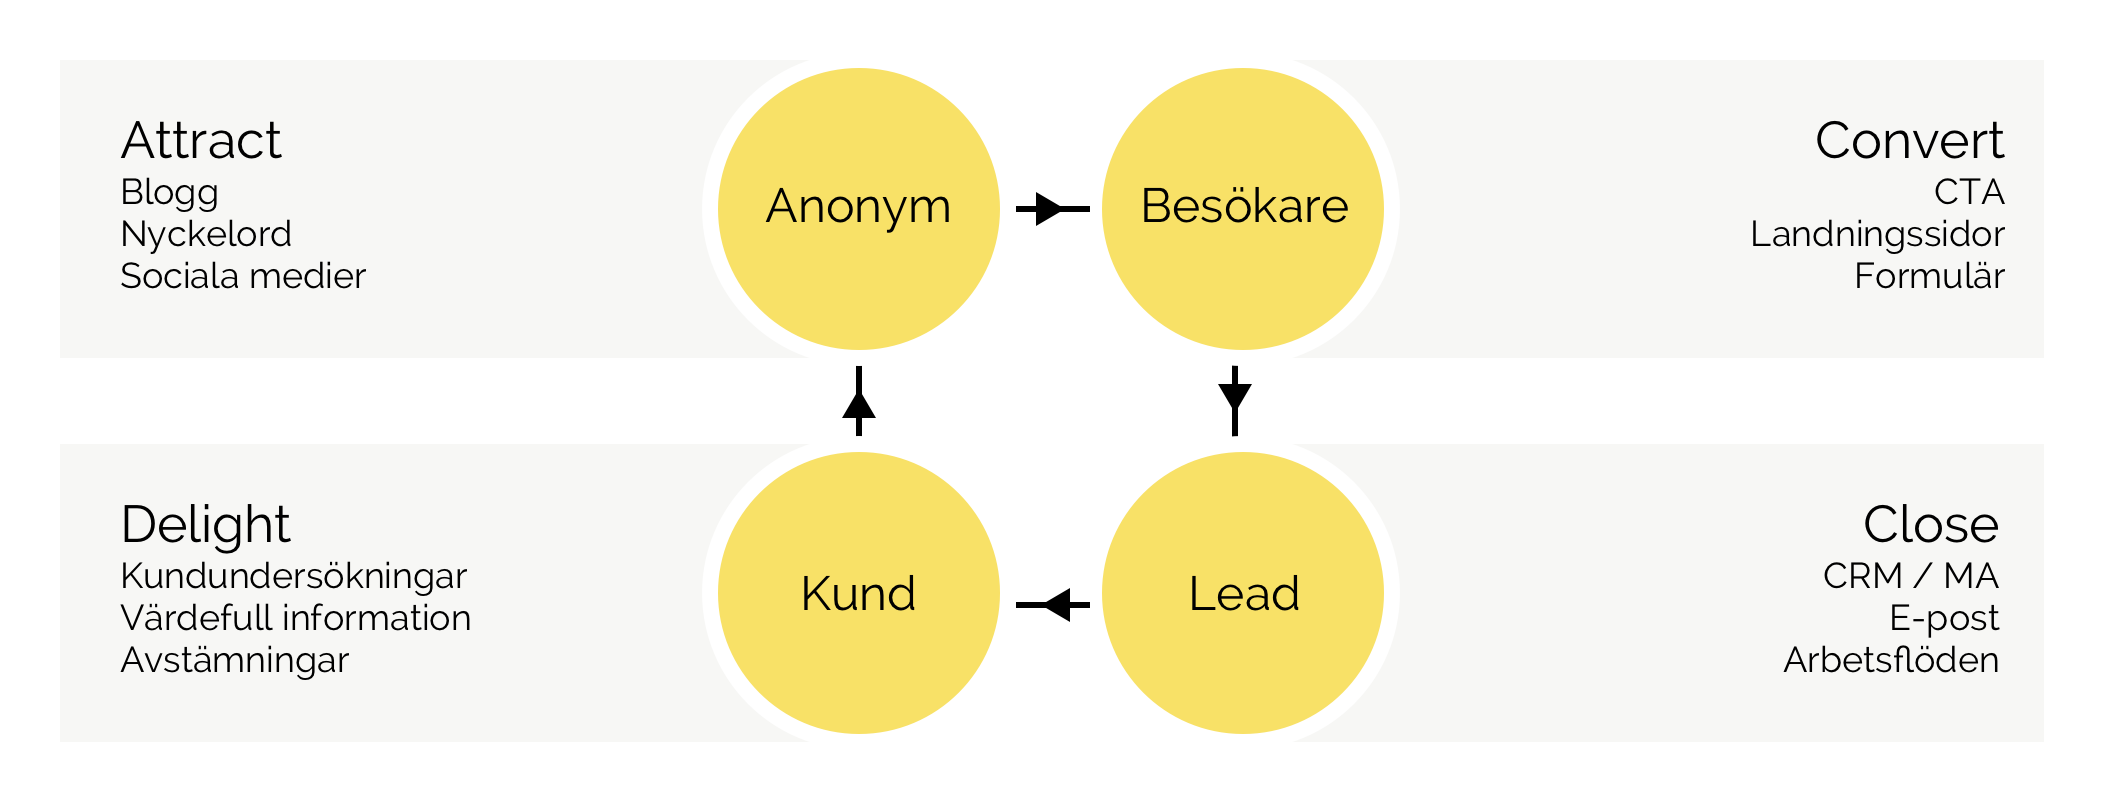 inbound-marketing-metodik-knowit-experience